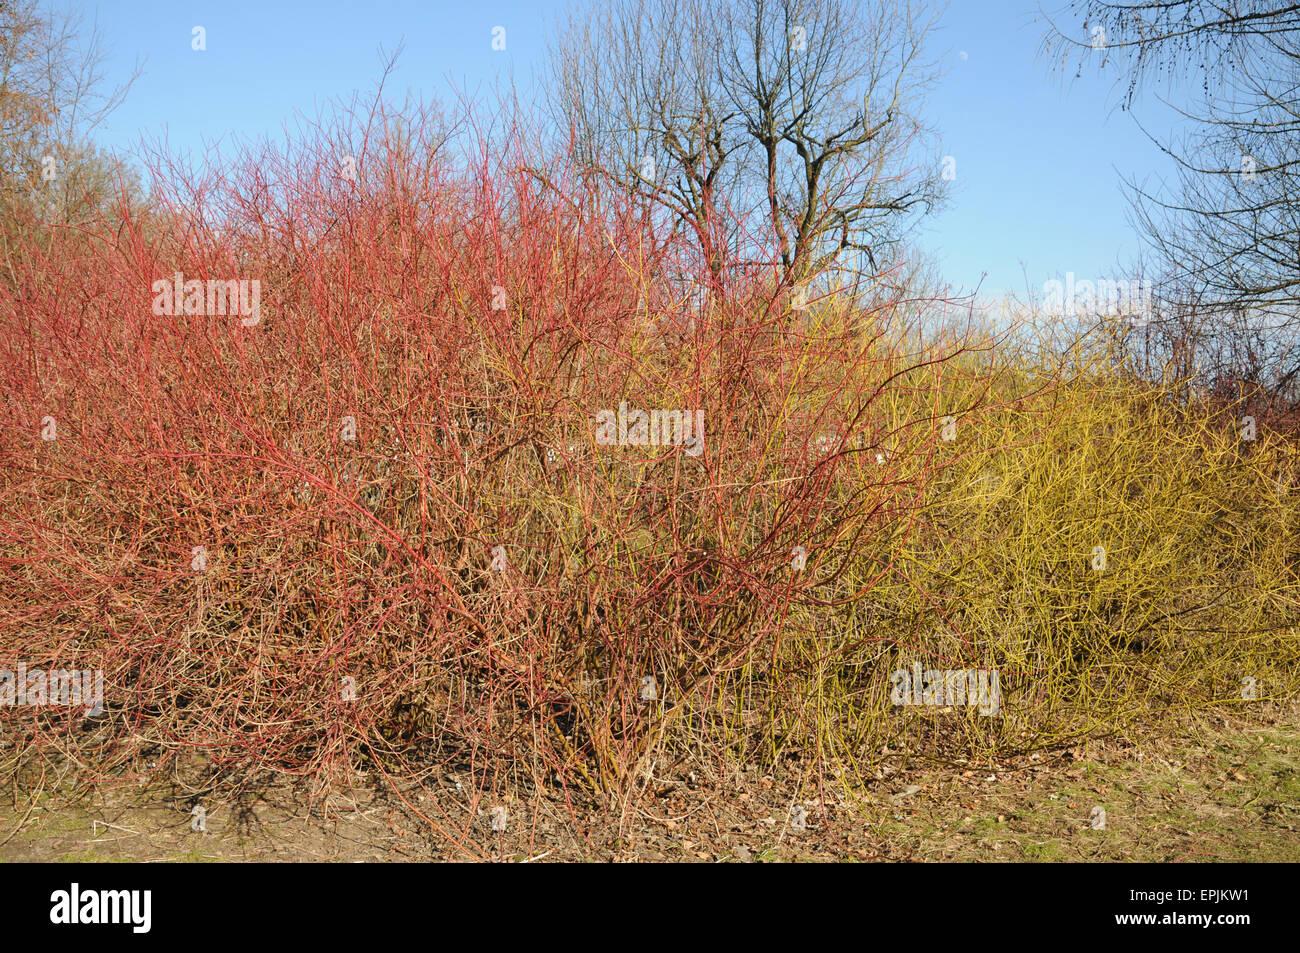 Siberian dogwood and Golden twig - Stock Image